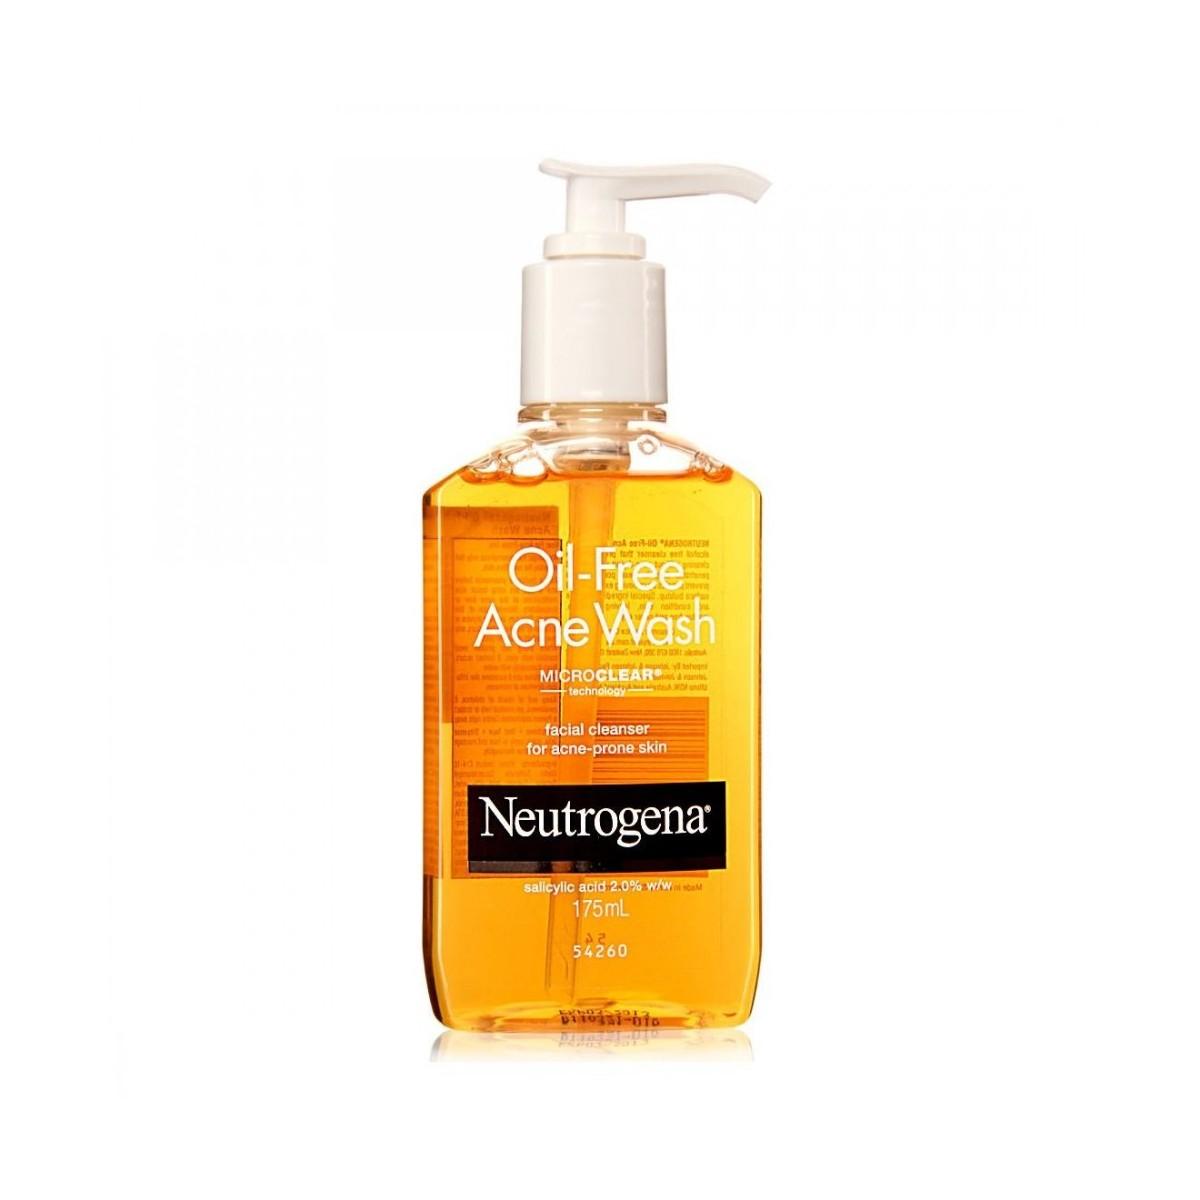 Neutrogena Oil Free Acne Wash review